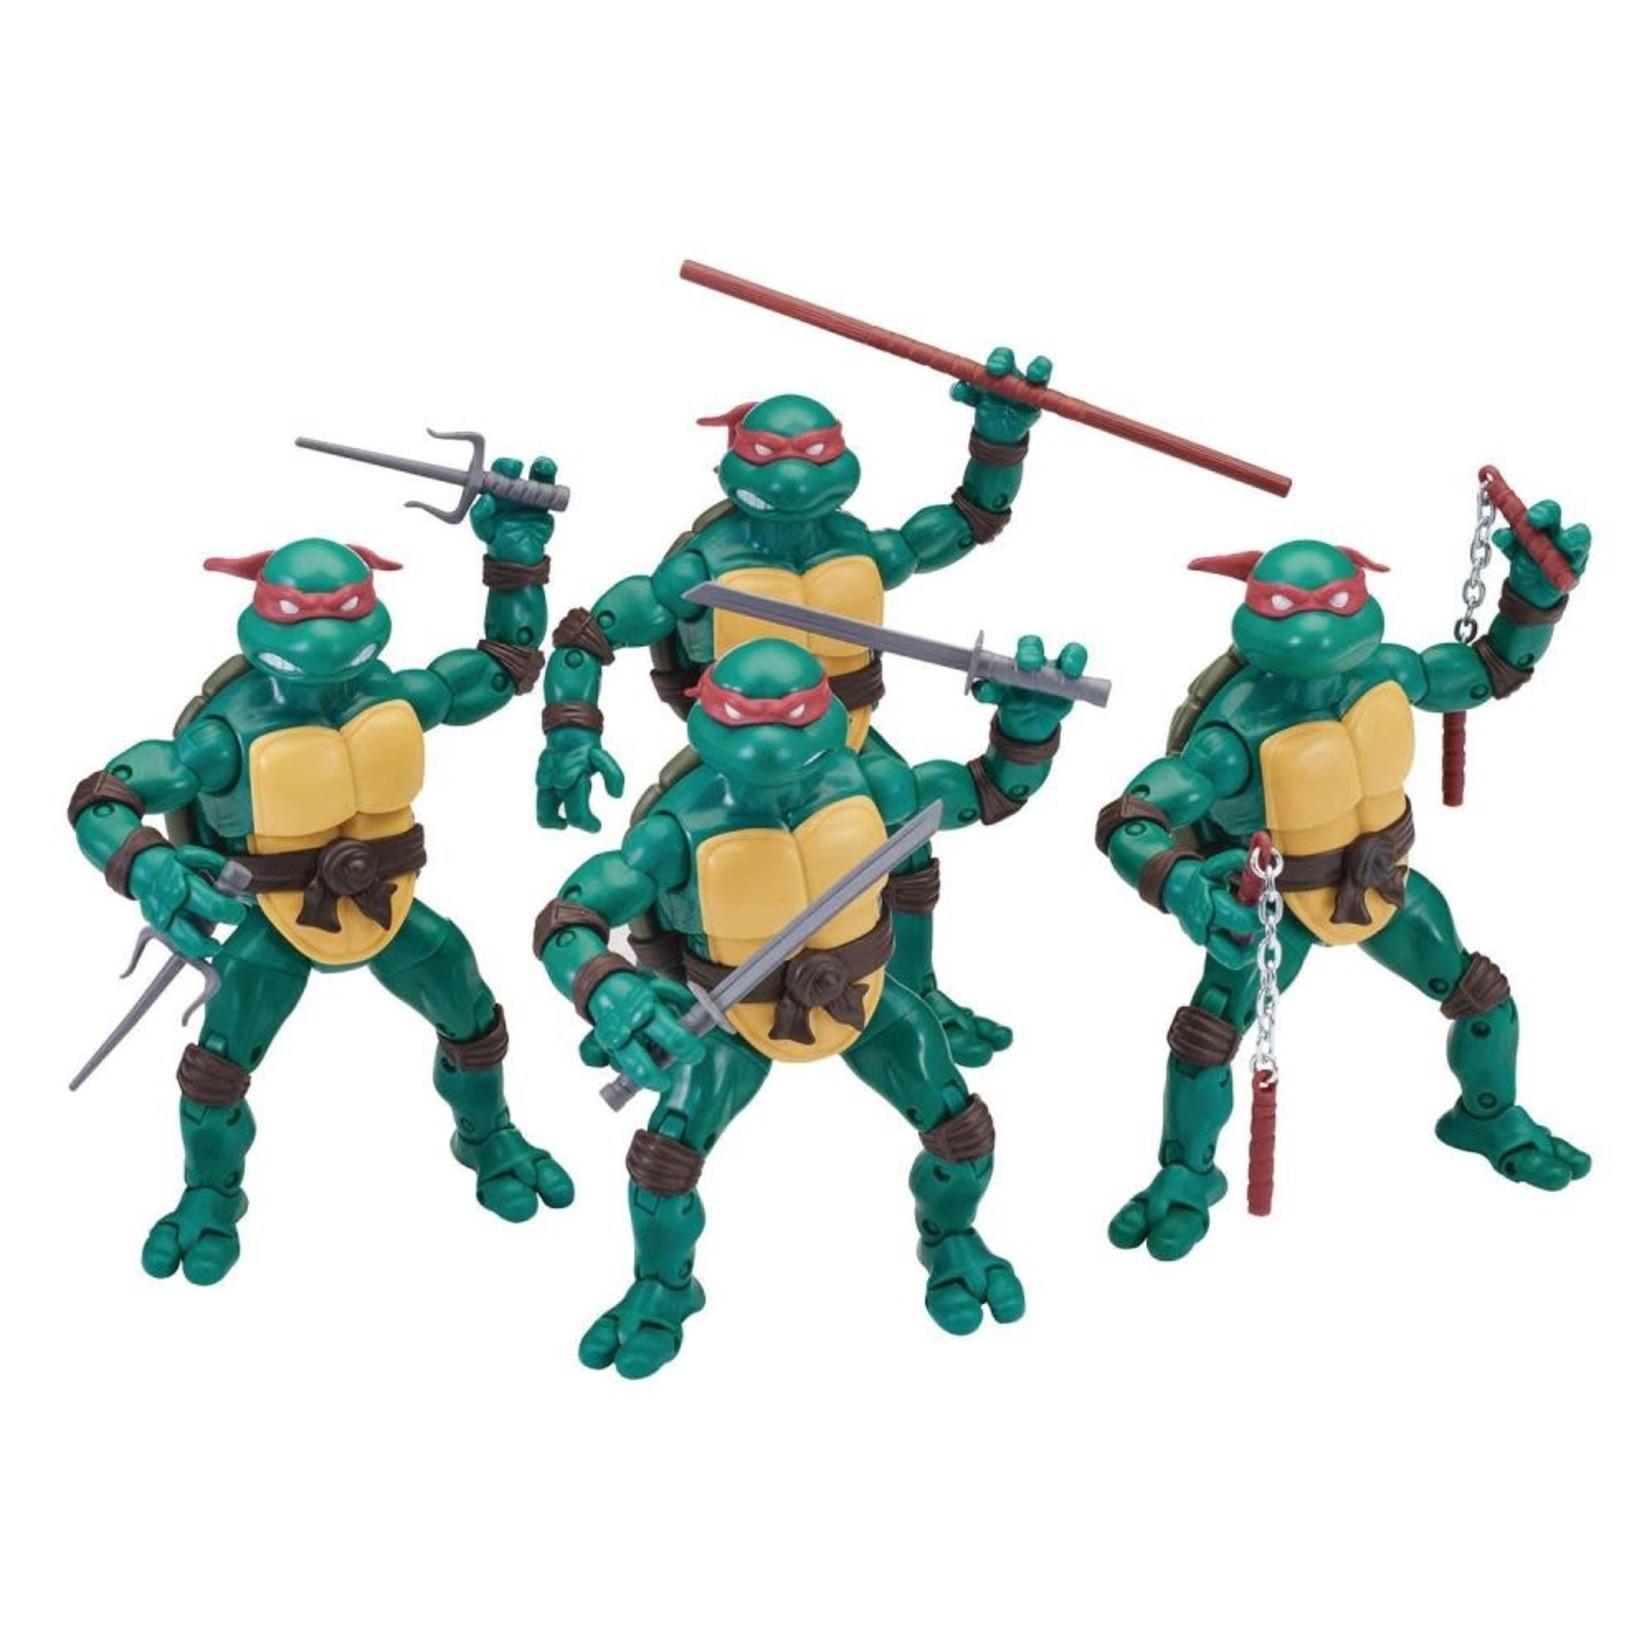 playmates TMNT Ninja Elite Series PX Previews Exclusive - Michelangelo